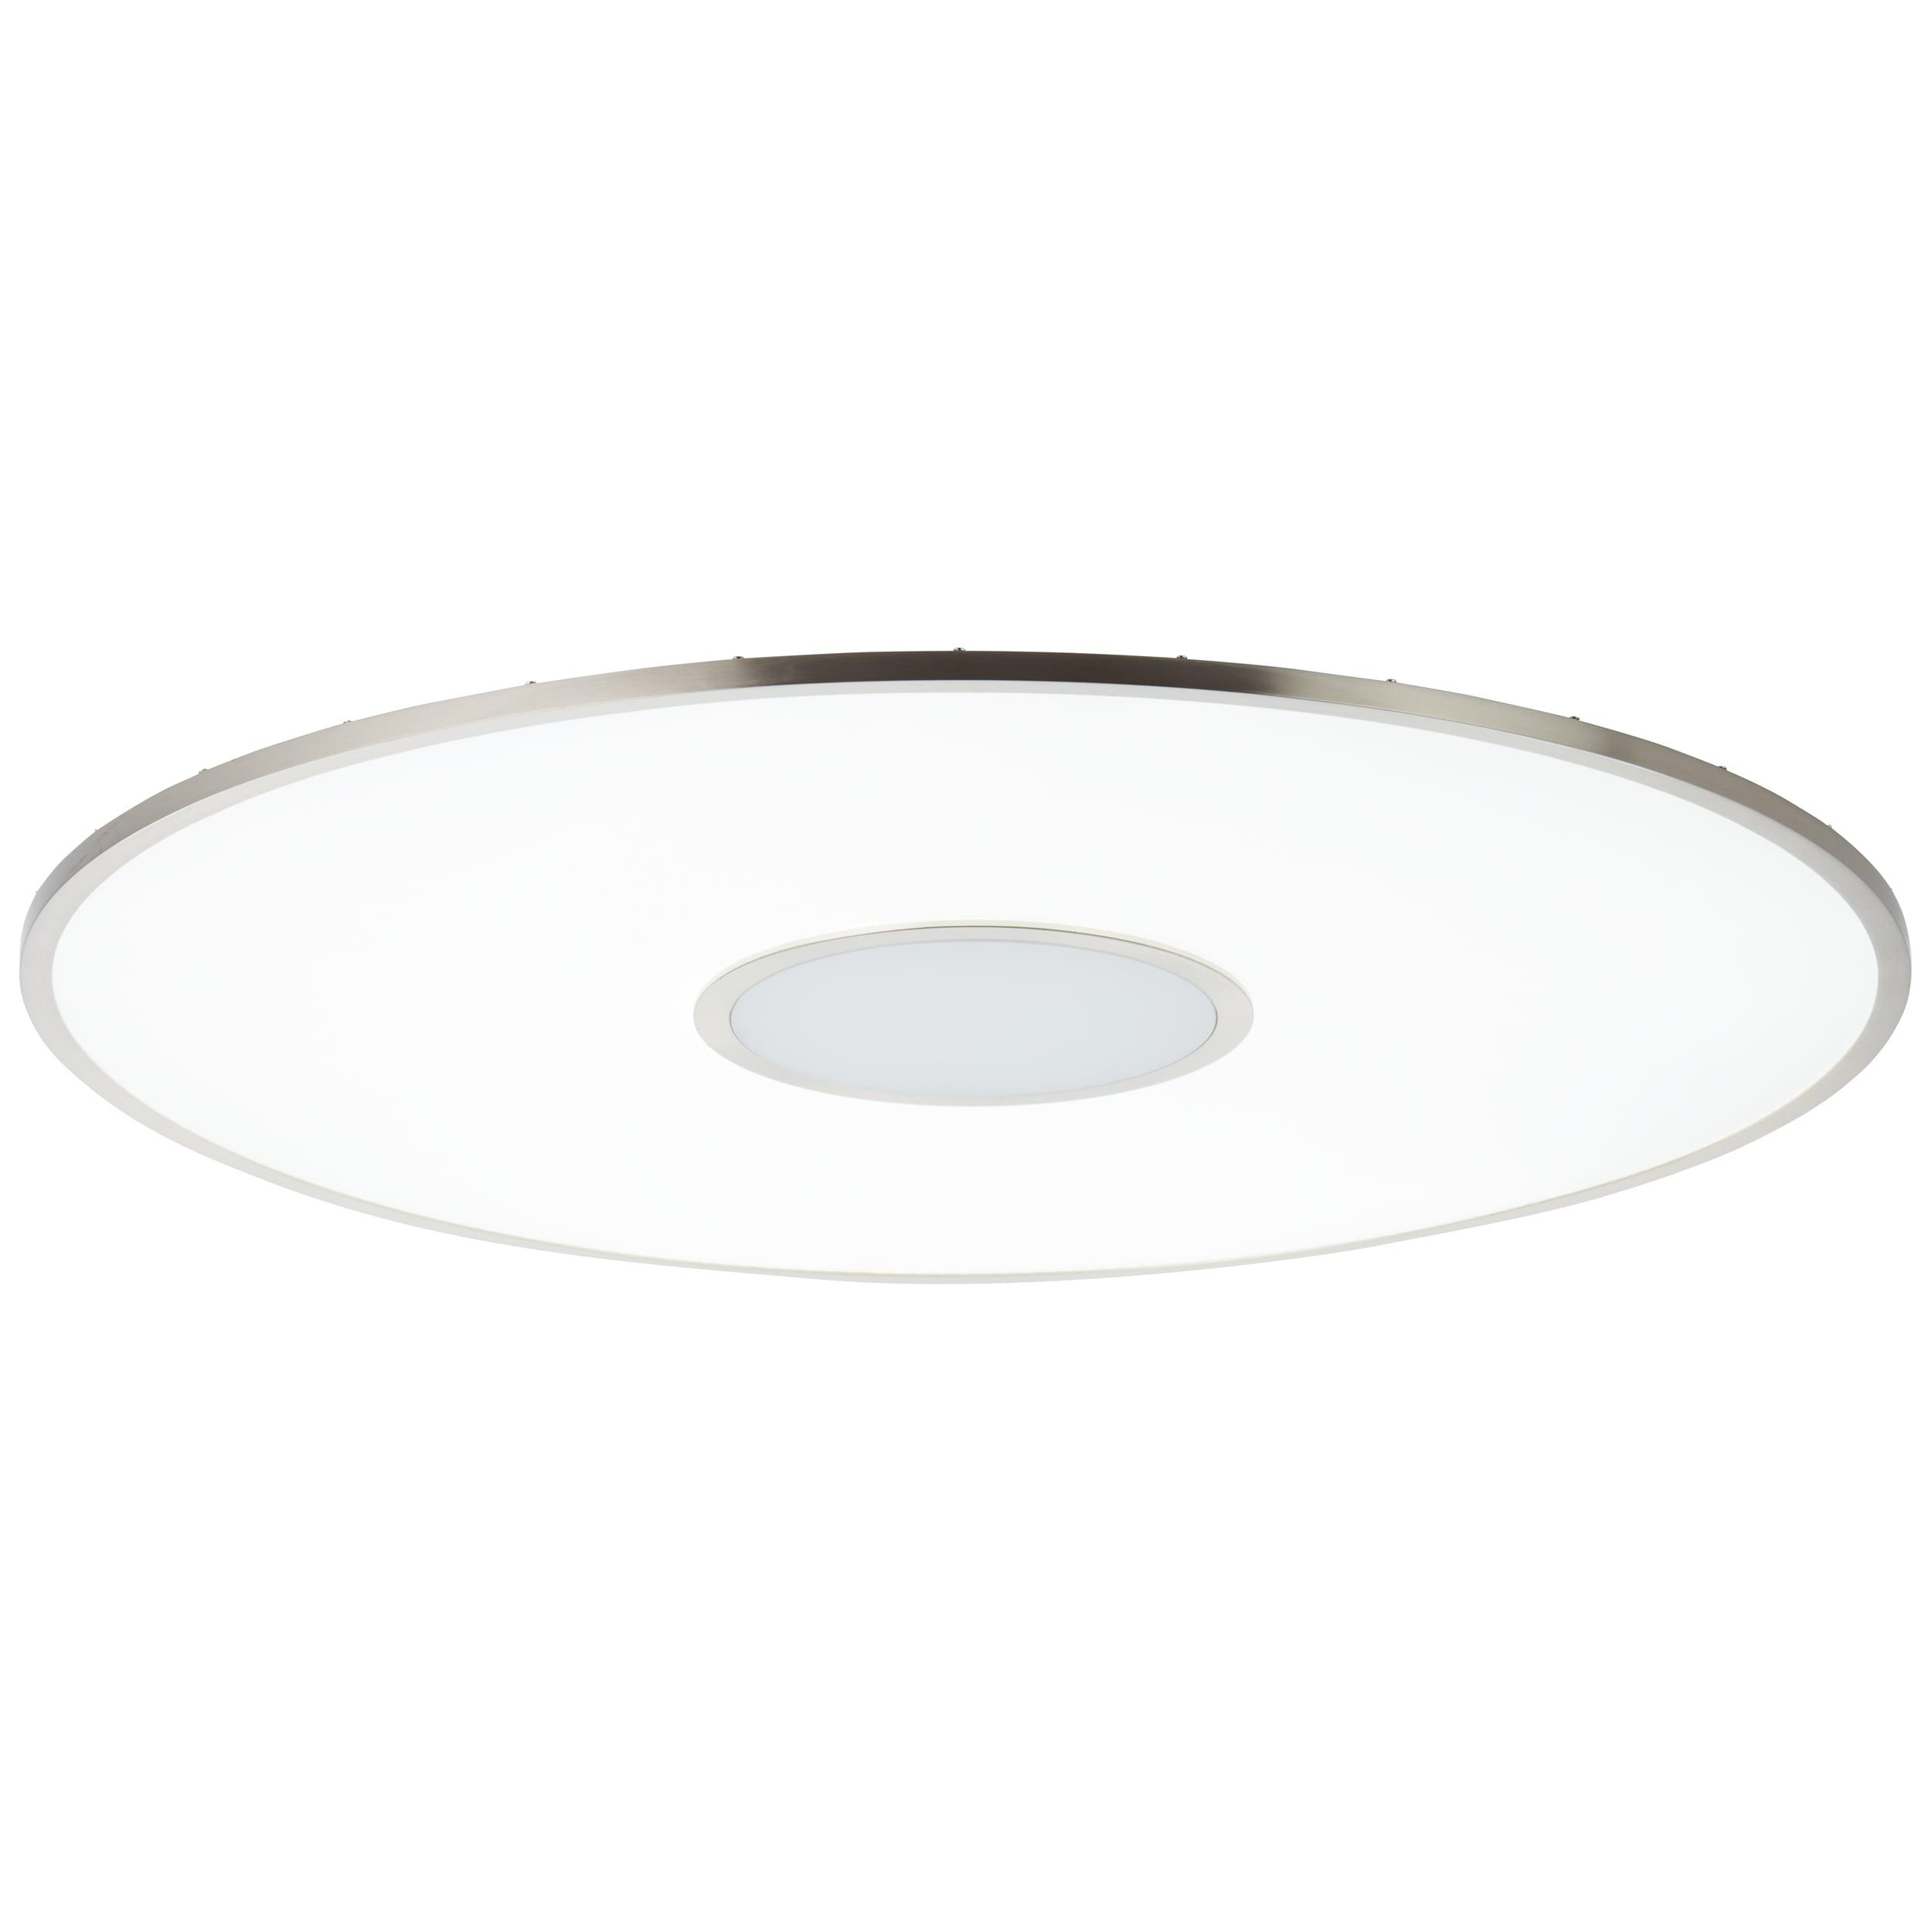 AEG Carmina LED Deckenaufbau-Paneel 75cm RGB nickel matt